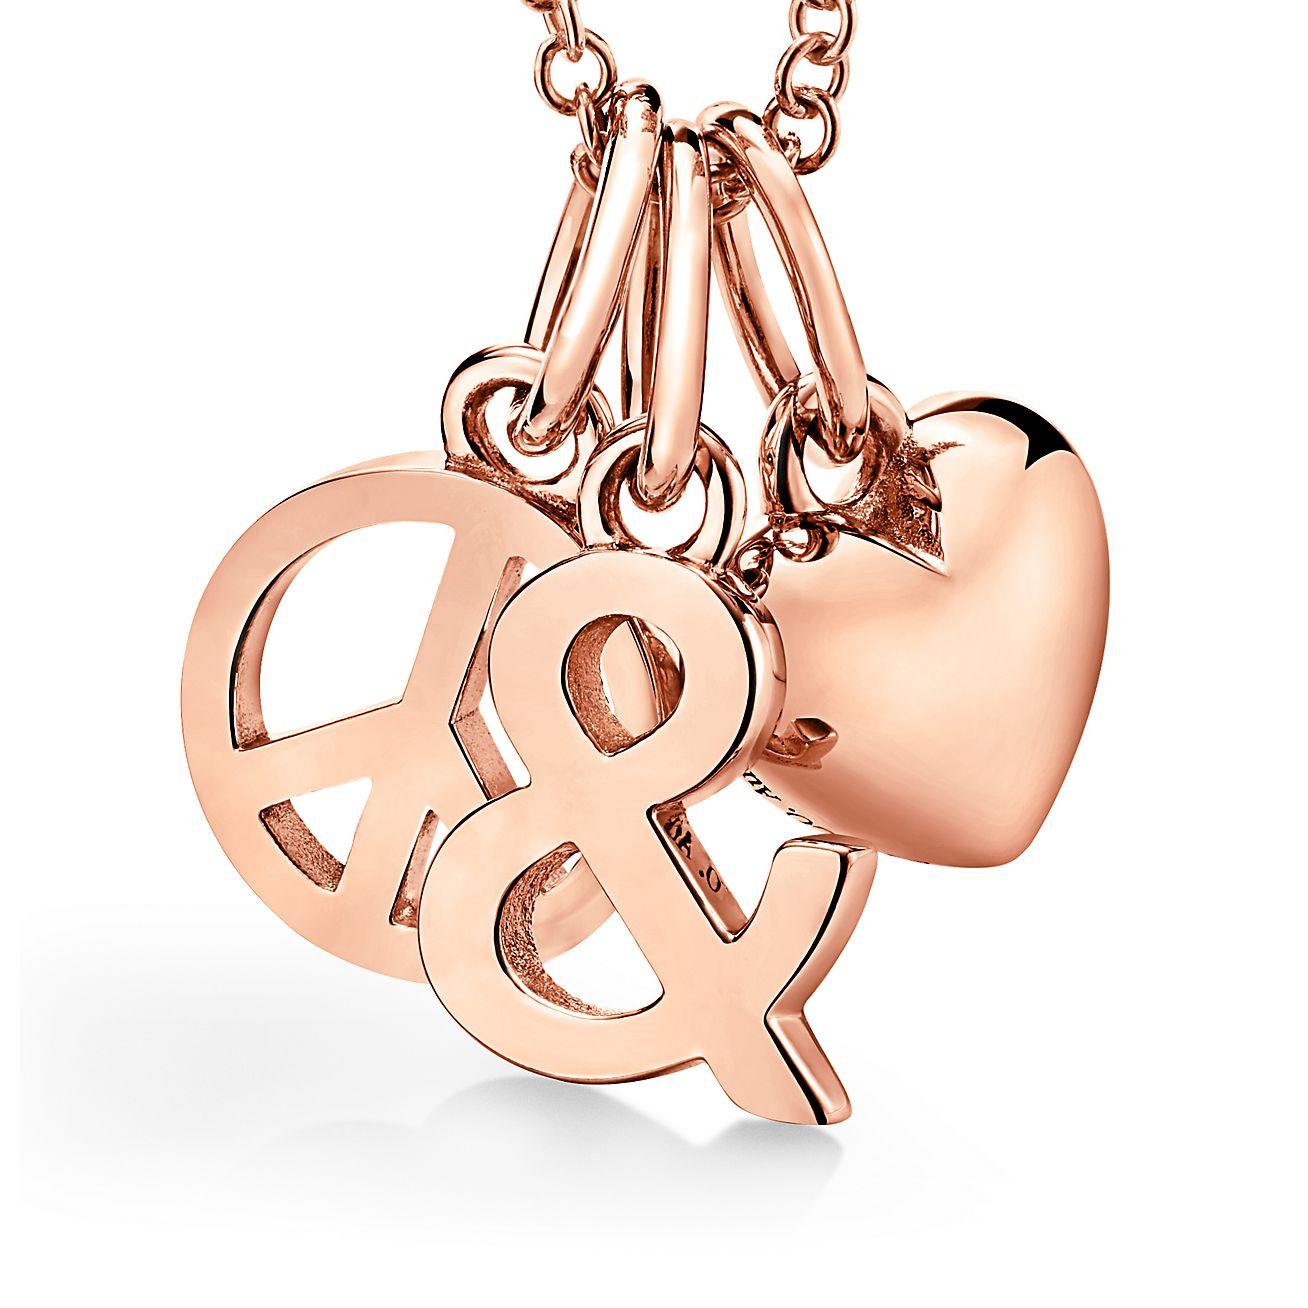 "Tiffany & Love Anhänger ""Peace and Love"" in 18 Karat Roségold"